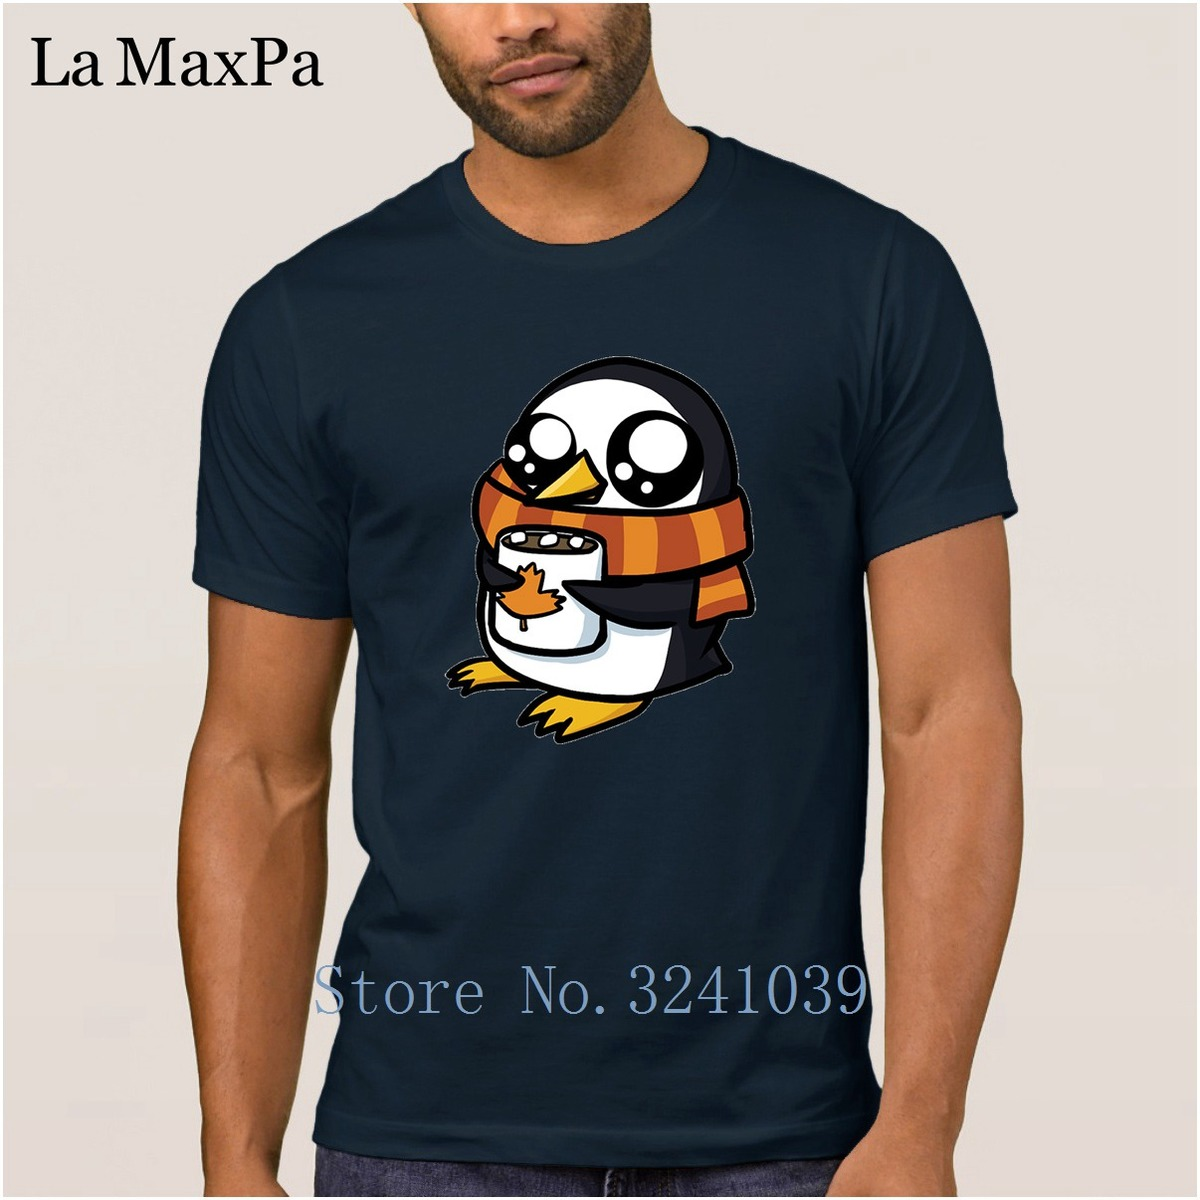 Costume New T Shirt For Men Cotton Spring Autumn Men Tshirt Autumn Penguin T-Shirt Cute Tee Shirt Homme O-Neck Interesting